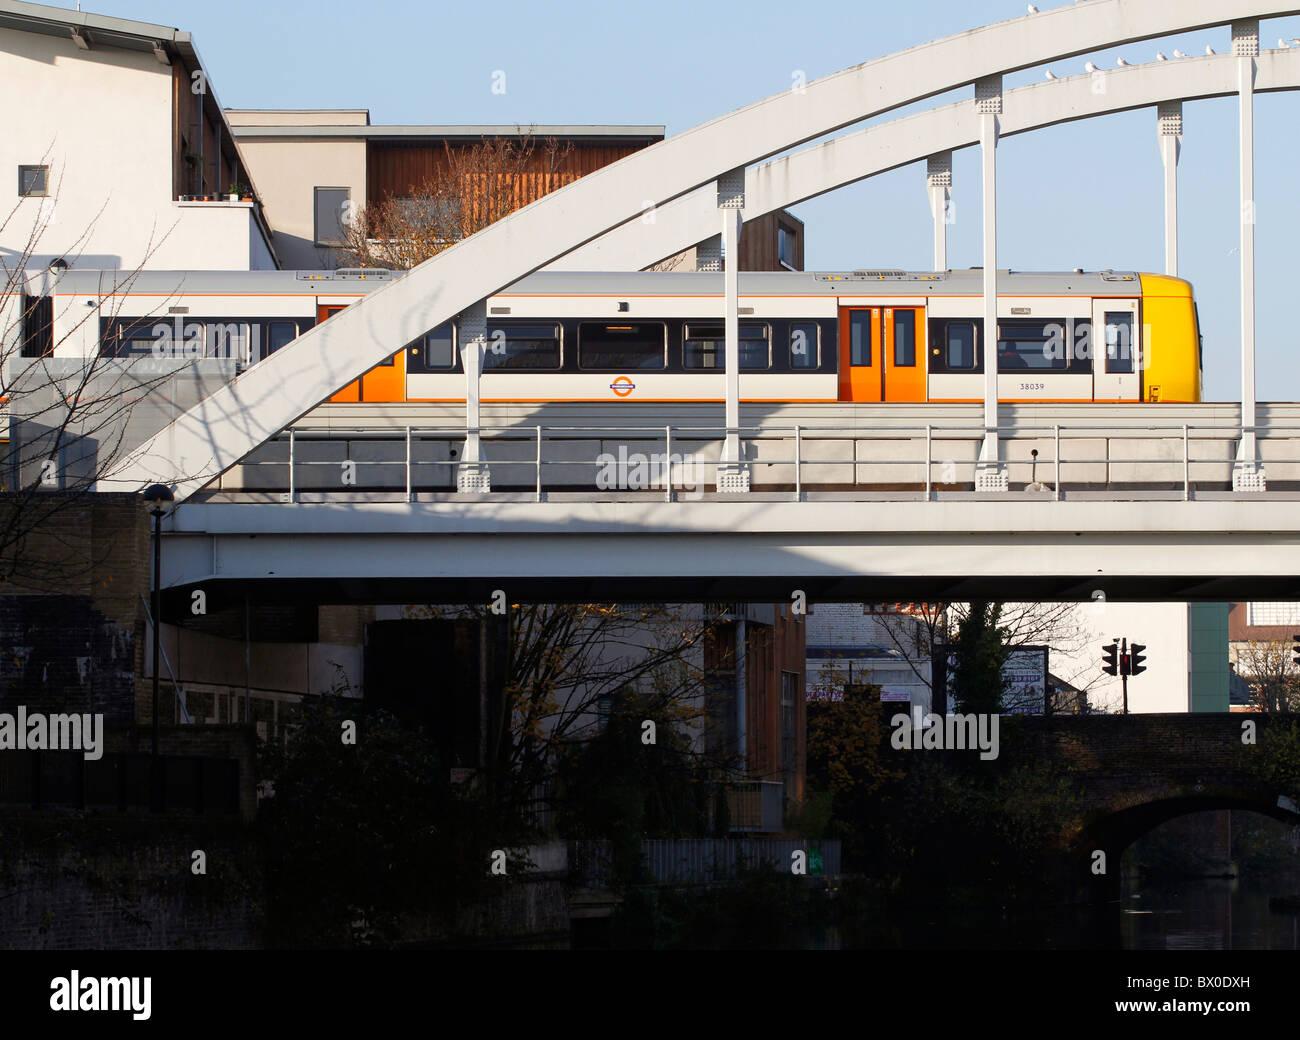 East London line overground train, Hackney, London, England - Stock Image